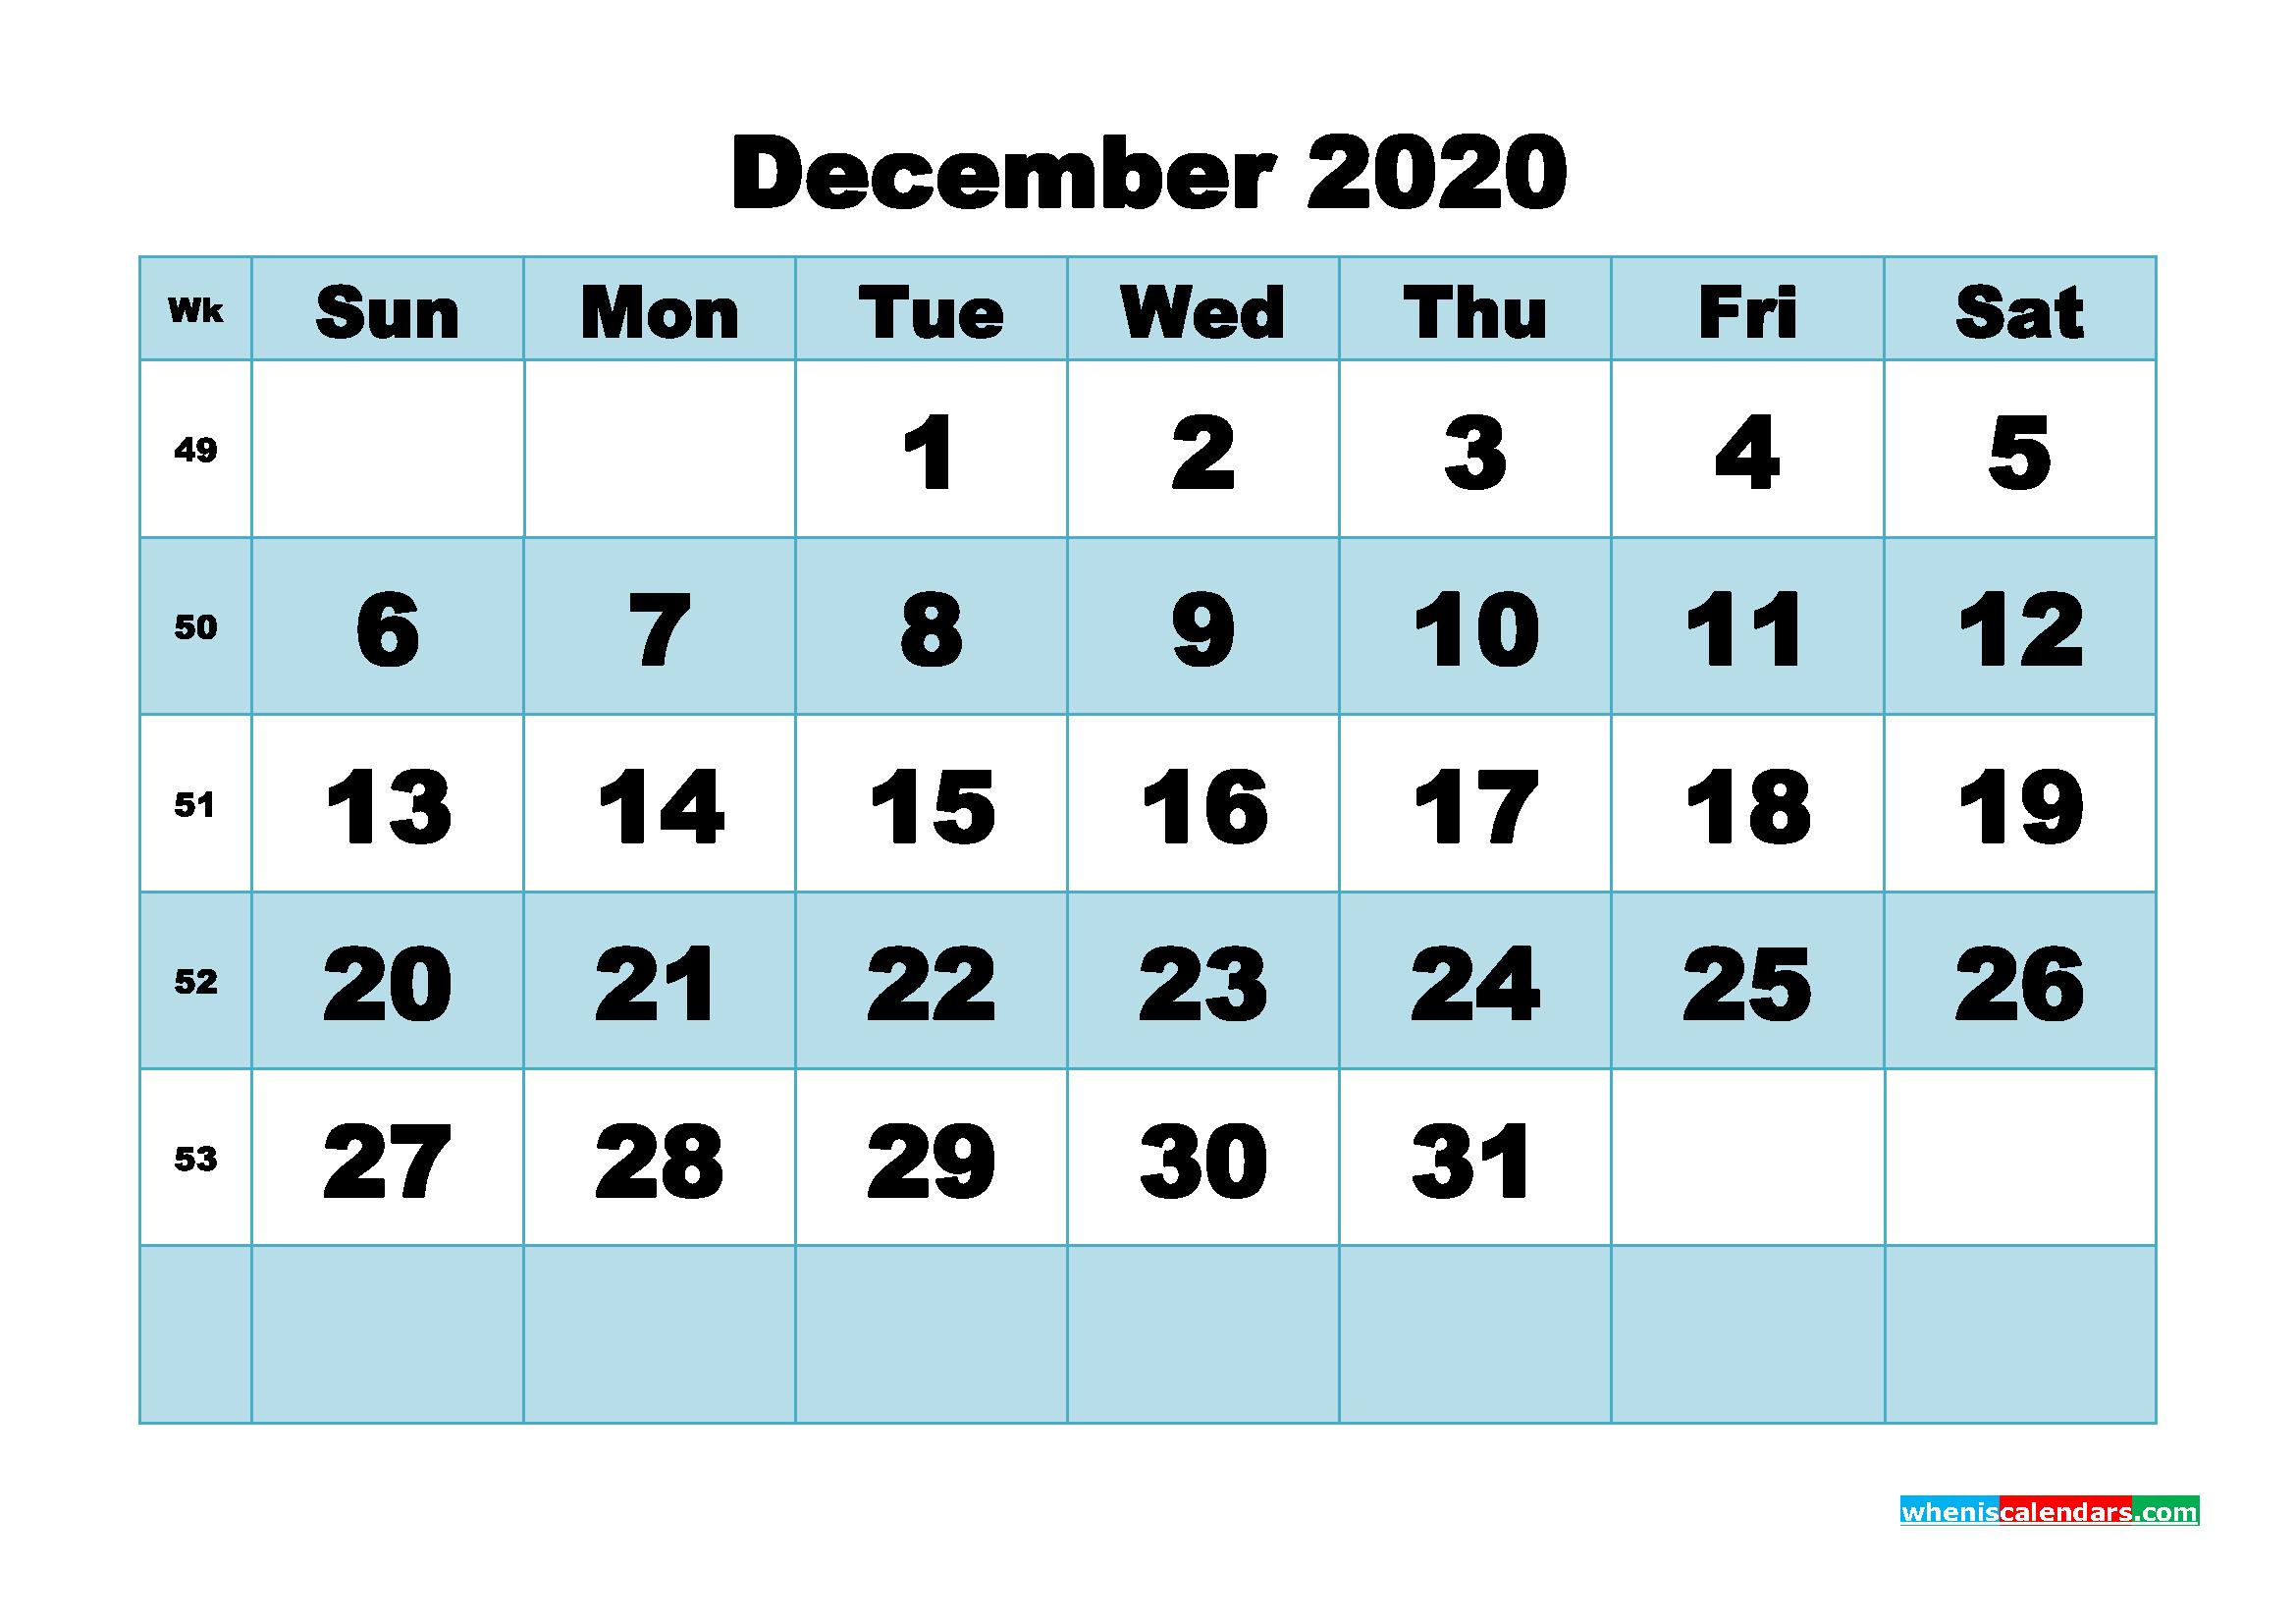 December 2020 Blank Calendar Printable - No.m20b504